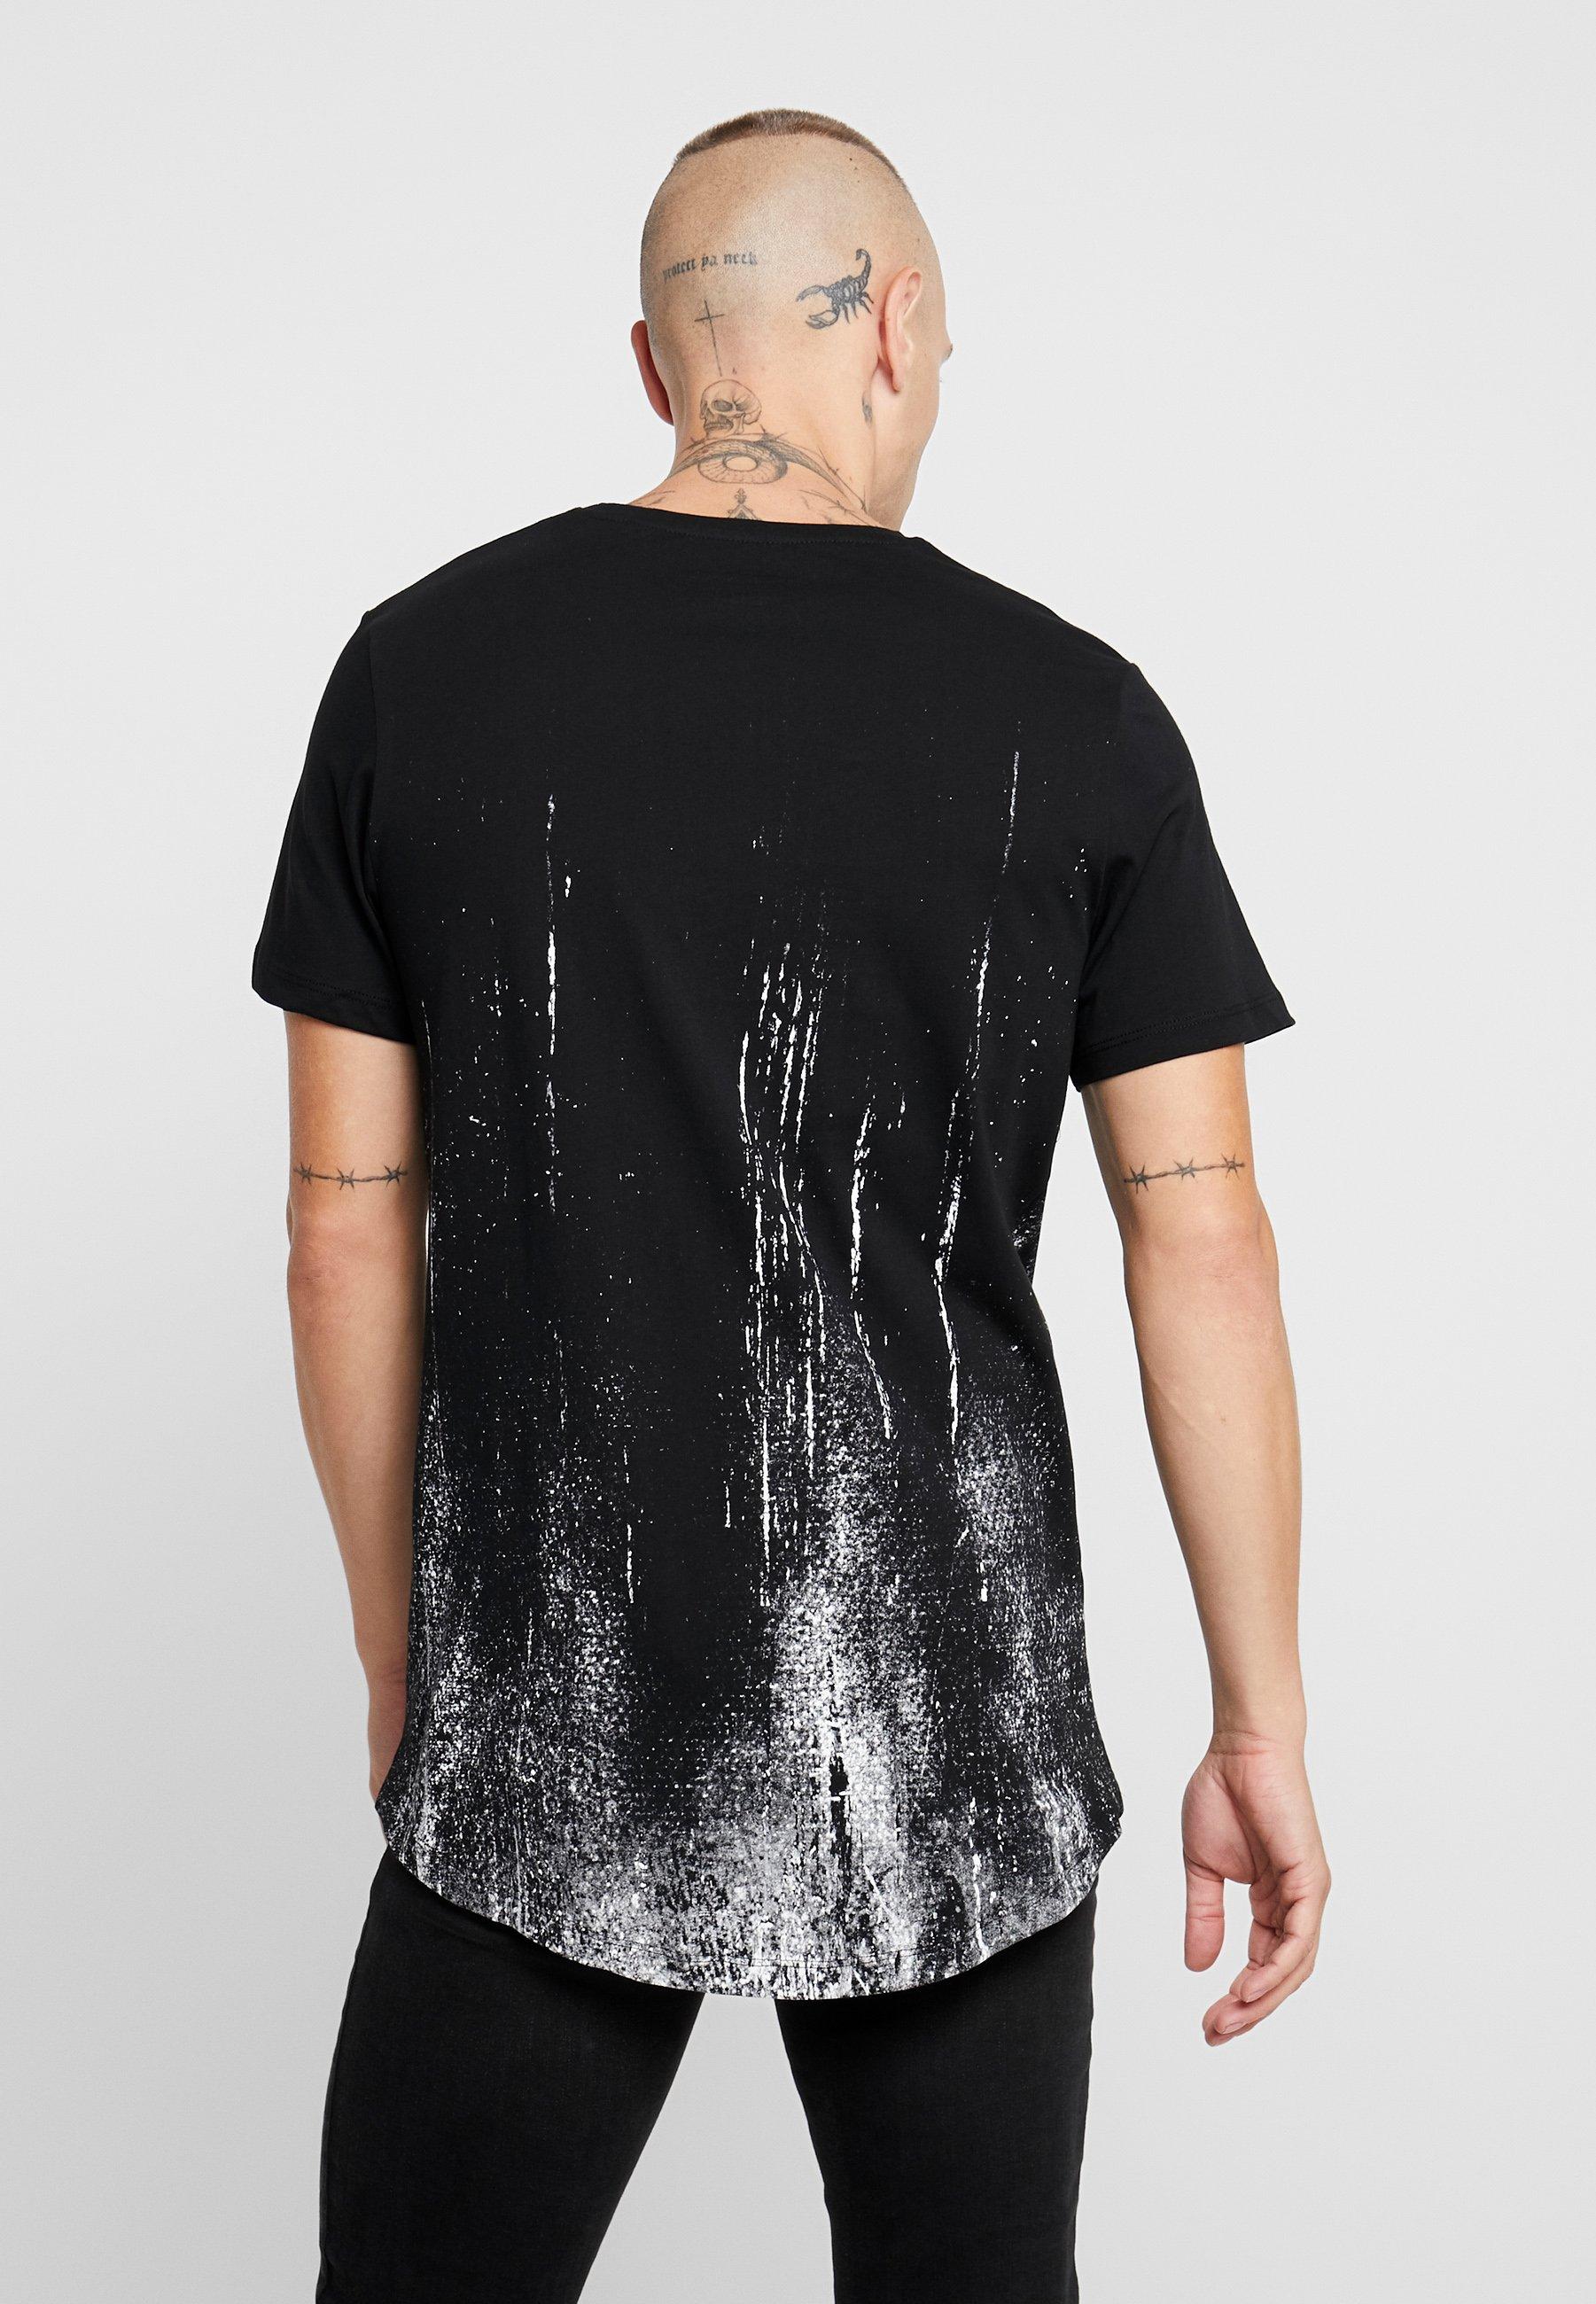 Jcoval Crew NeckT Jones Tap Jackamp; Shoe Tee Imprimé shirt 3TKl1cJuF